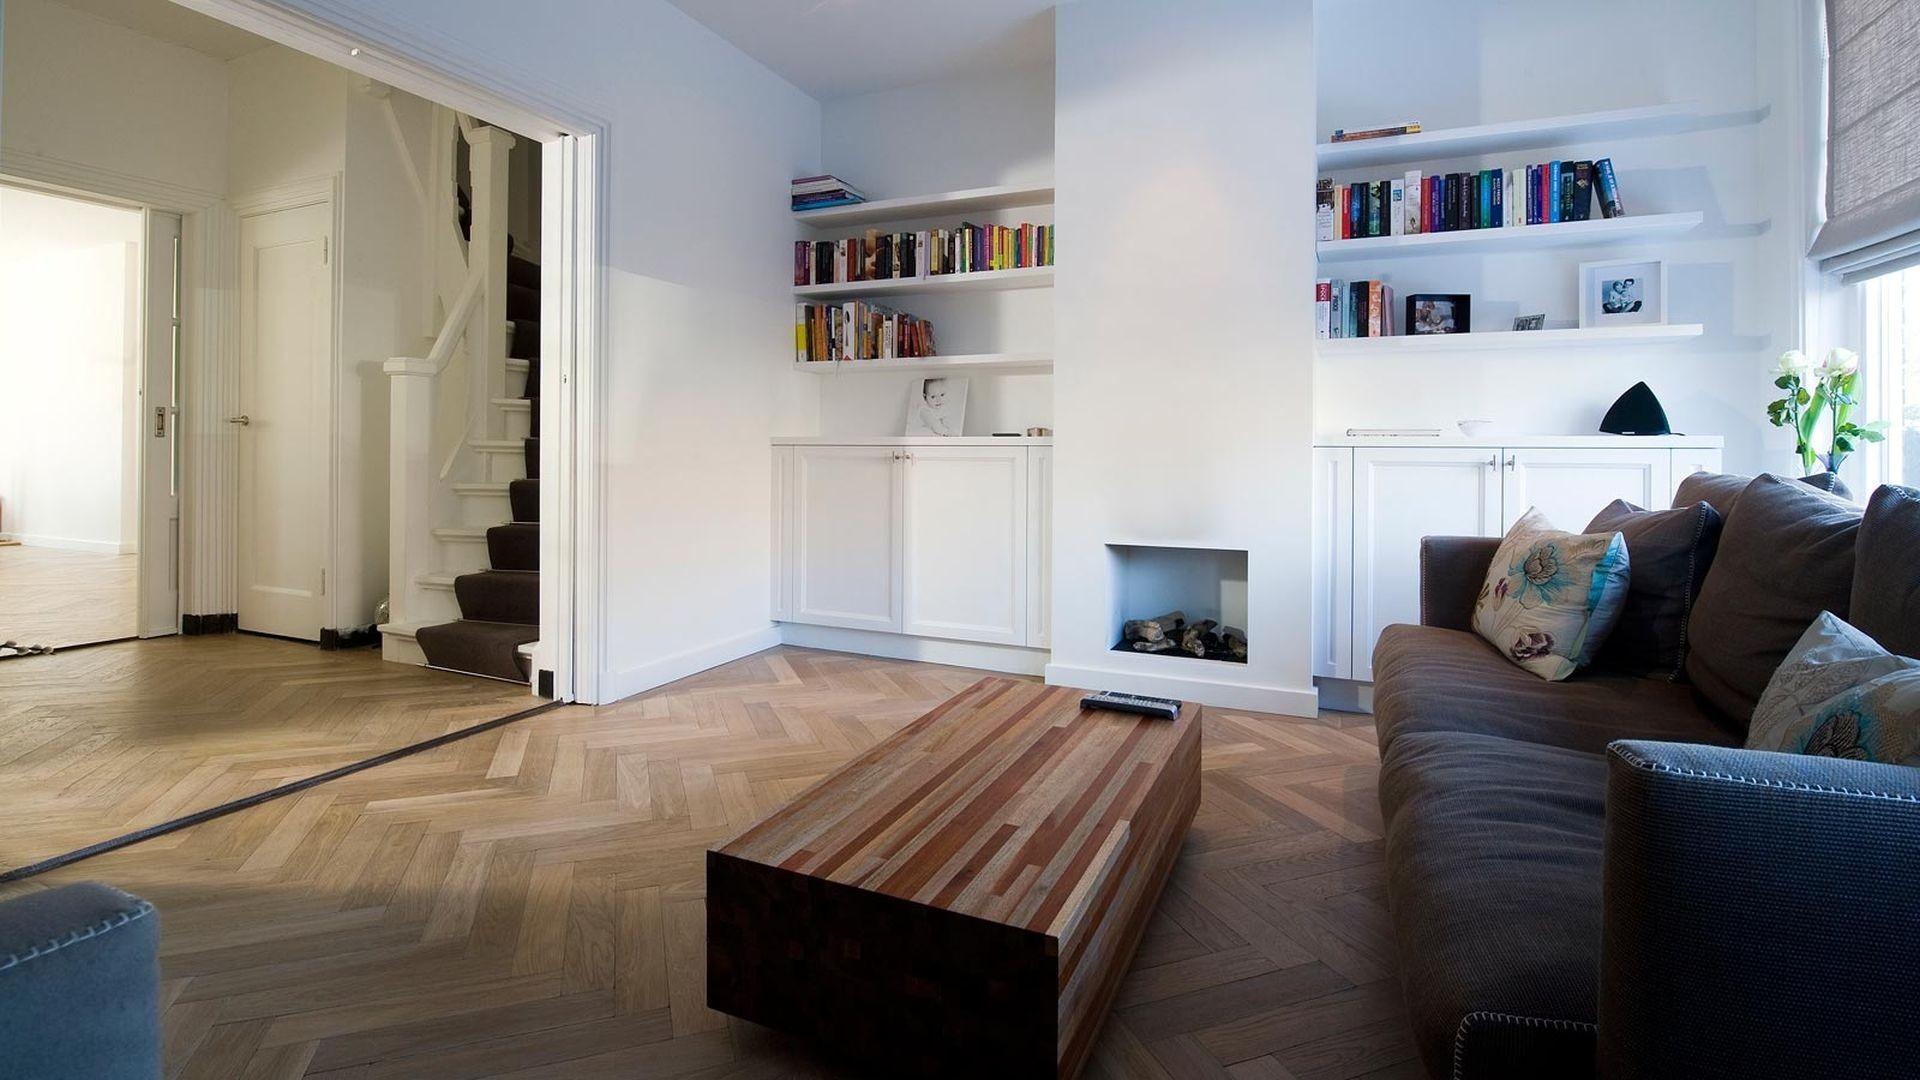 drewniana podłoga